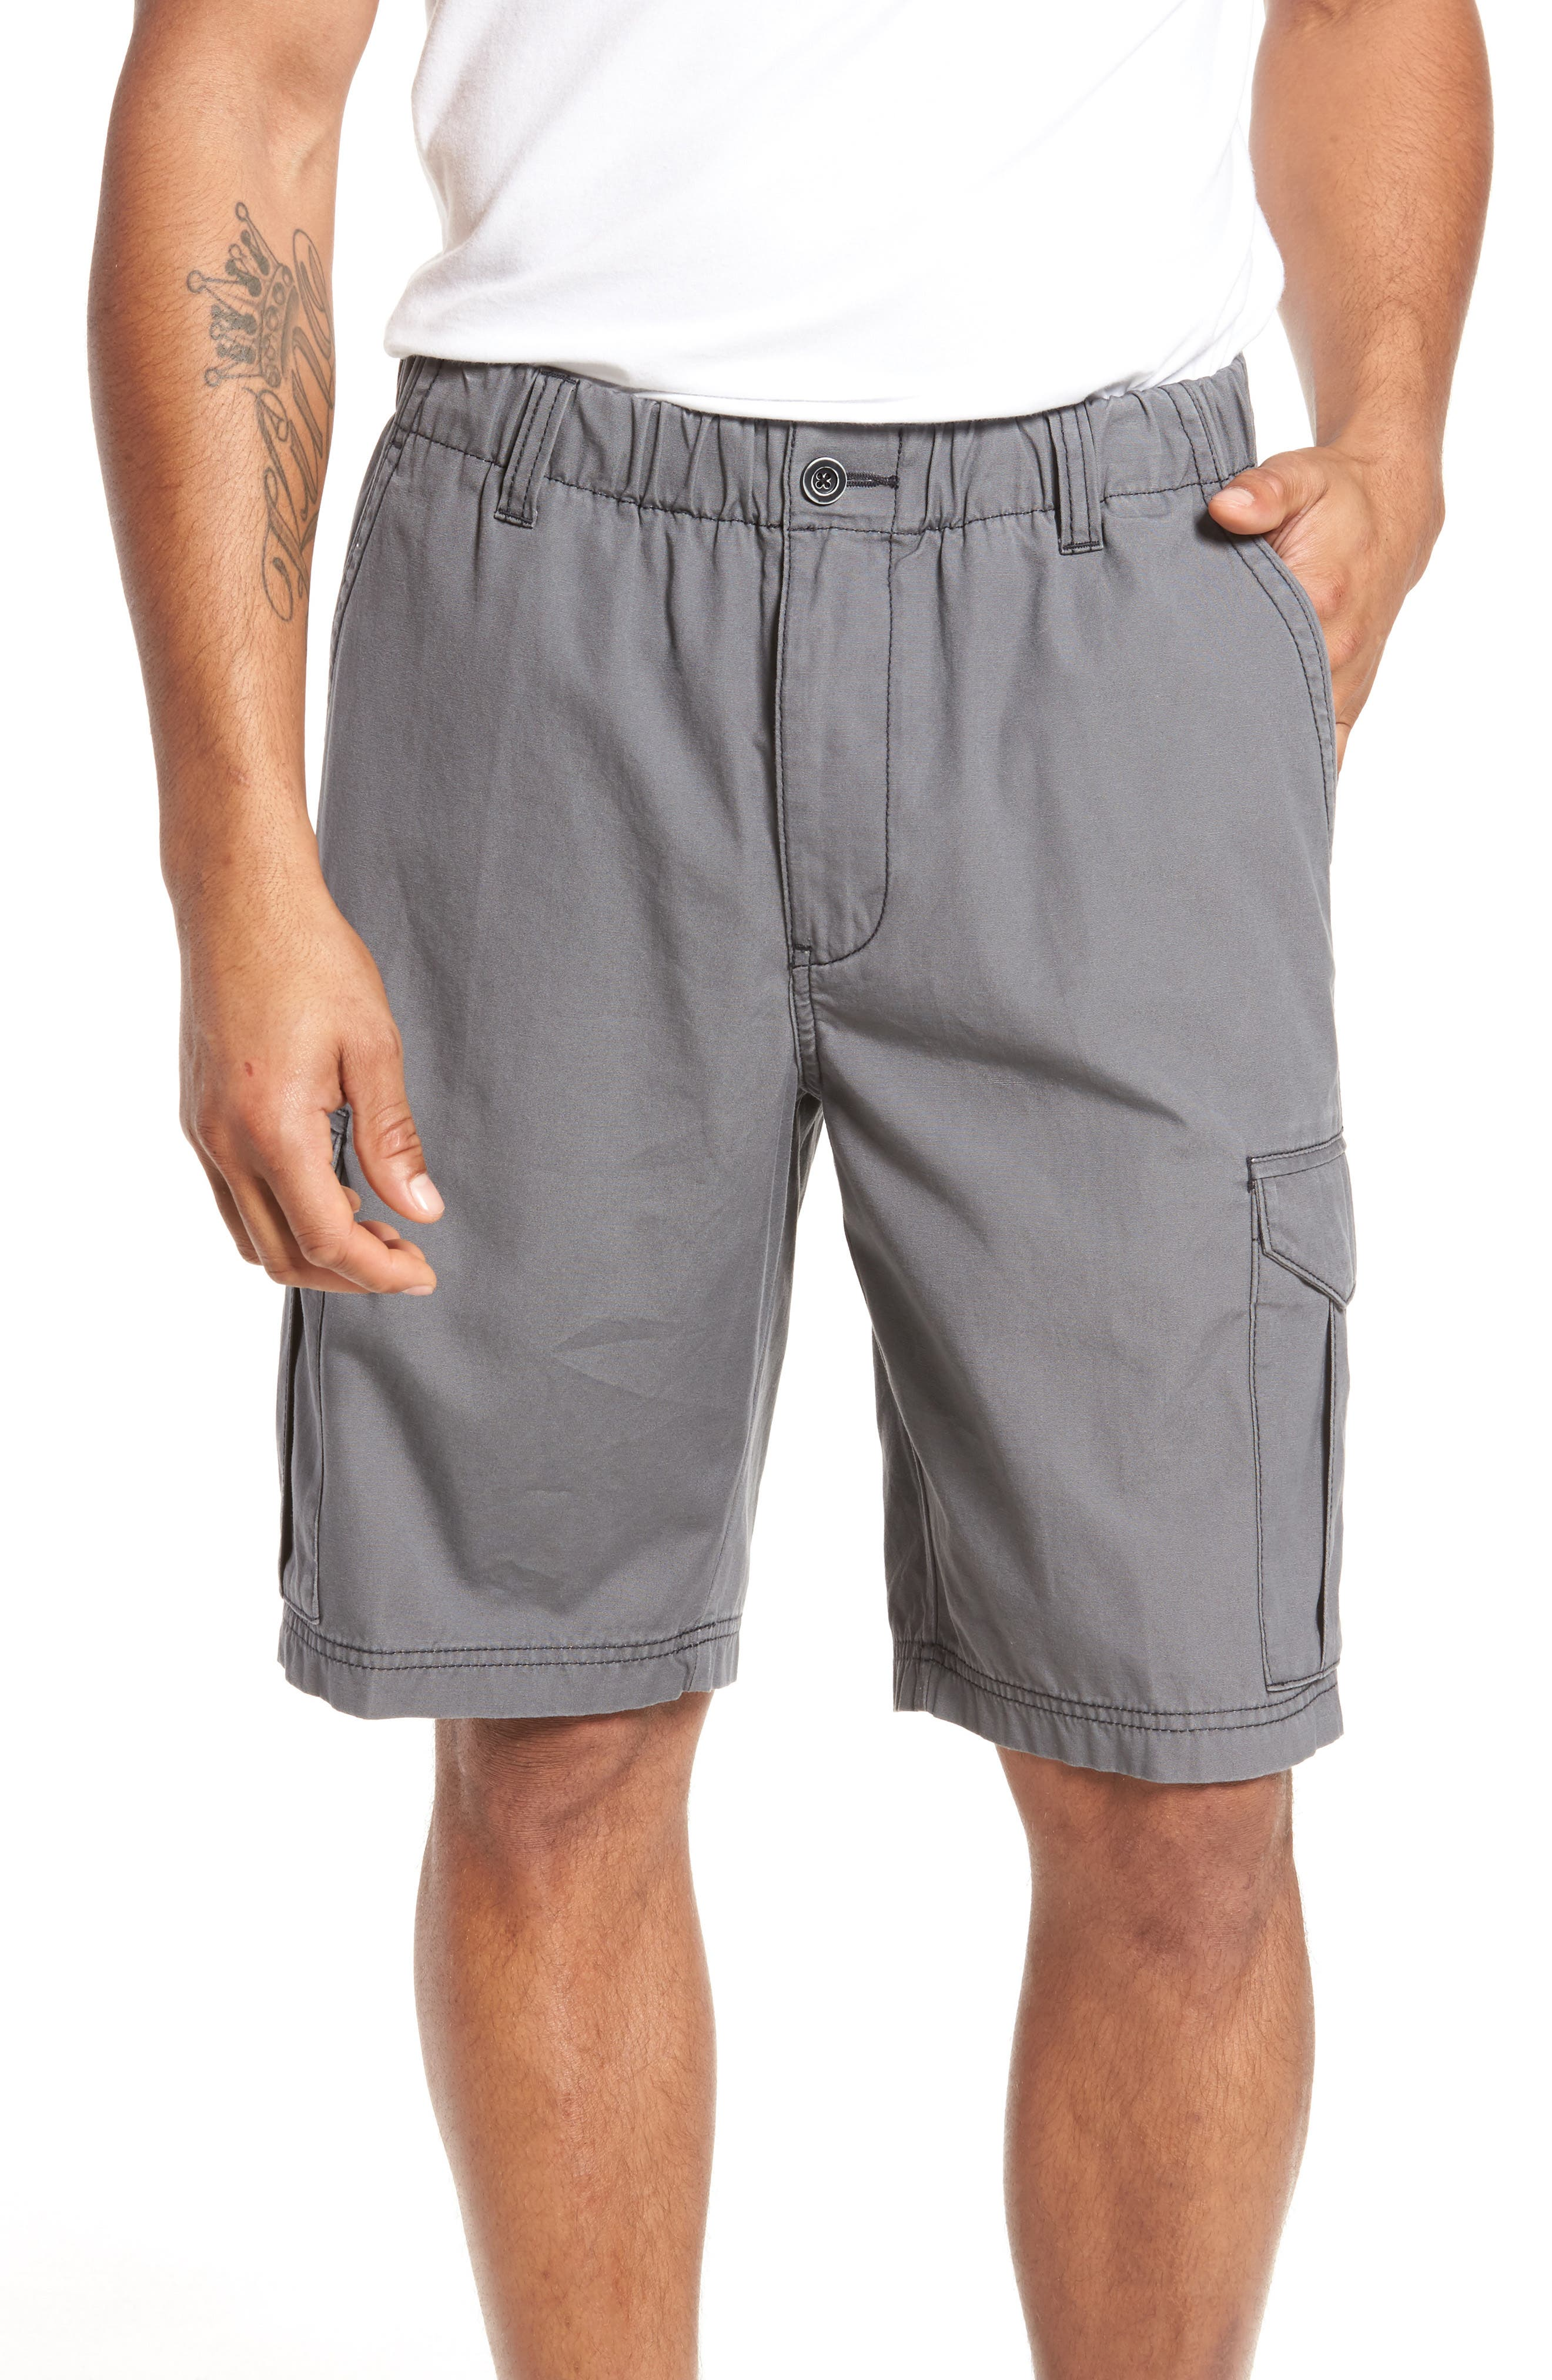 Island Survivalist Cargo Shorts,                             Main thumbnail 1, color,                             FOG GREY